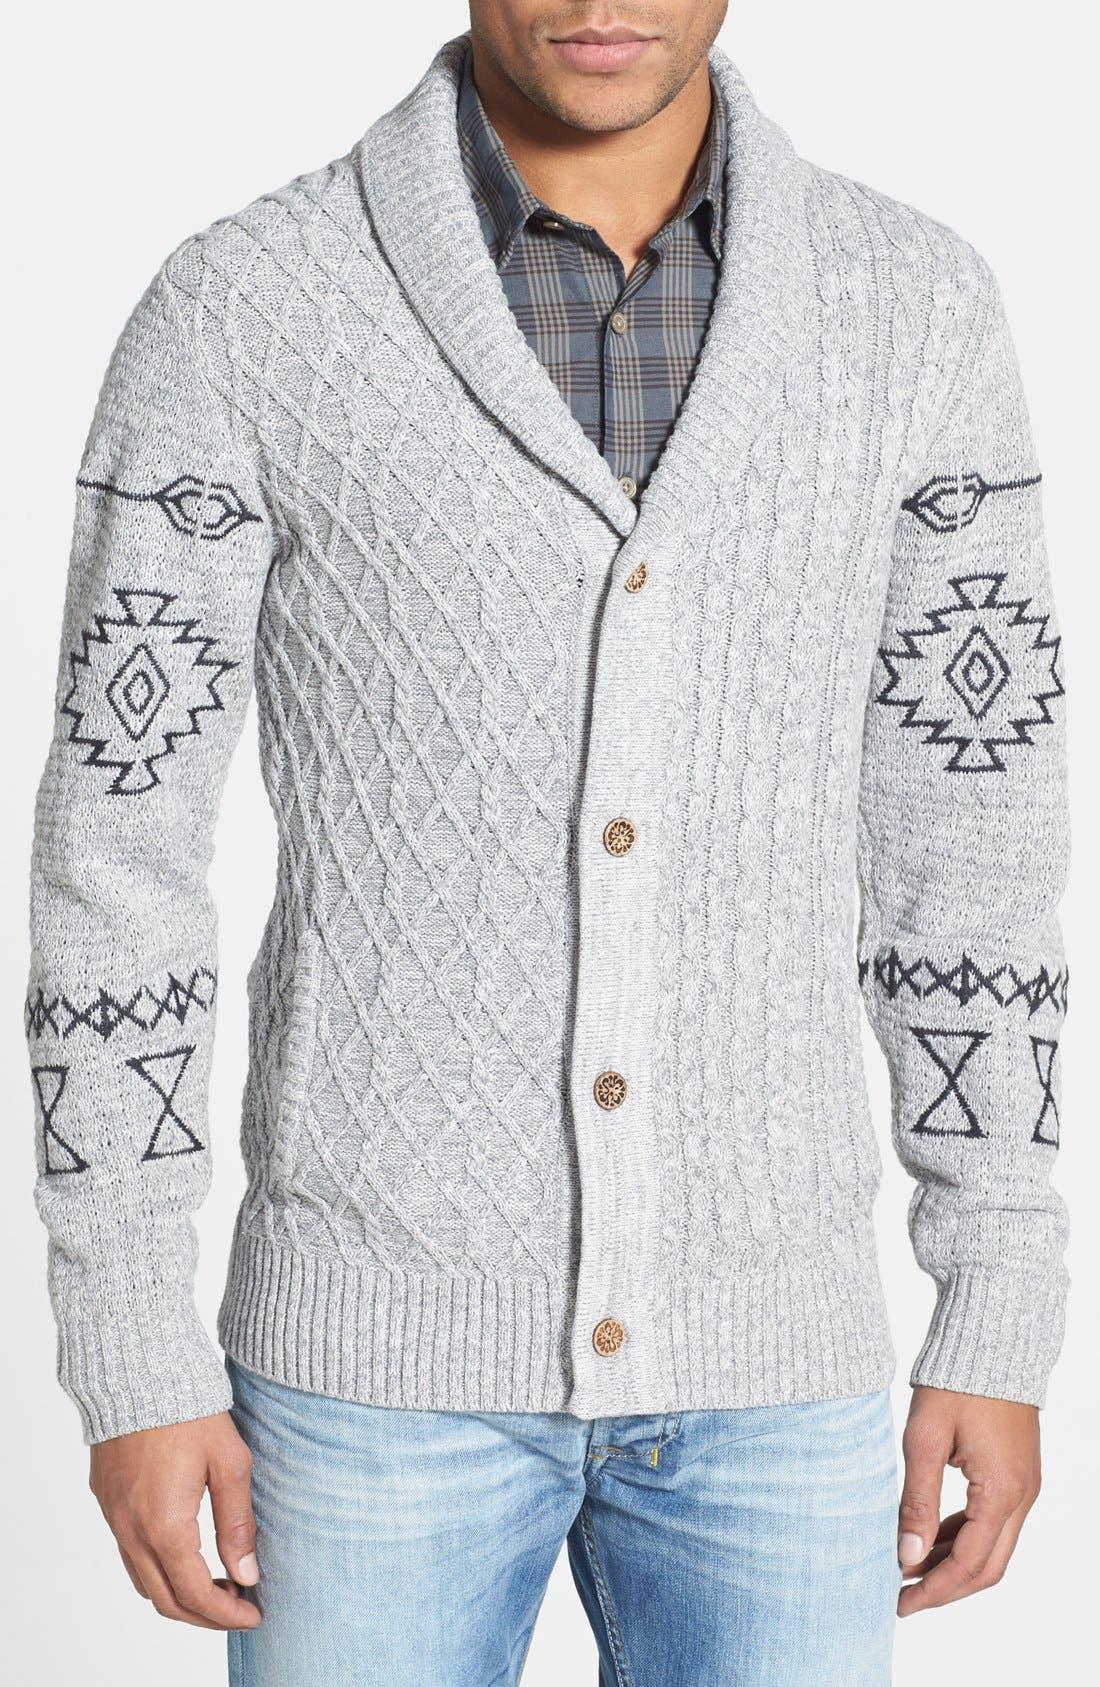 Main Image - ZANEROBE 'Sloan' Cable Knit Shawl Cardigan